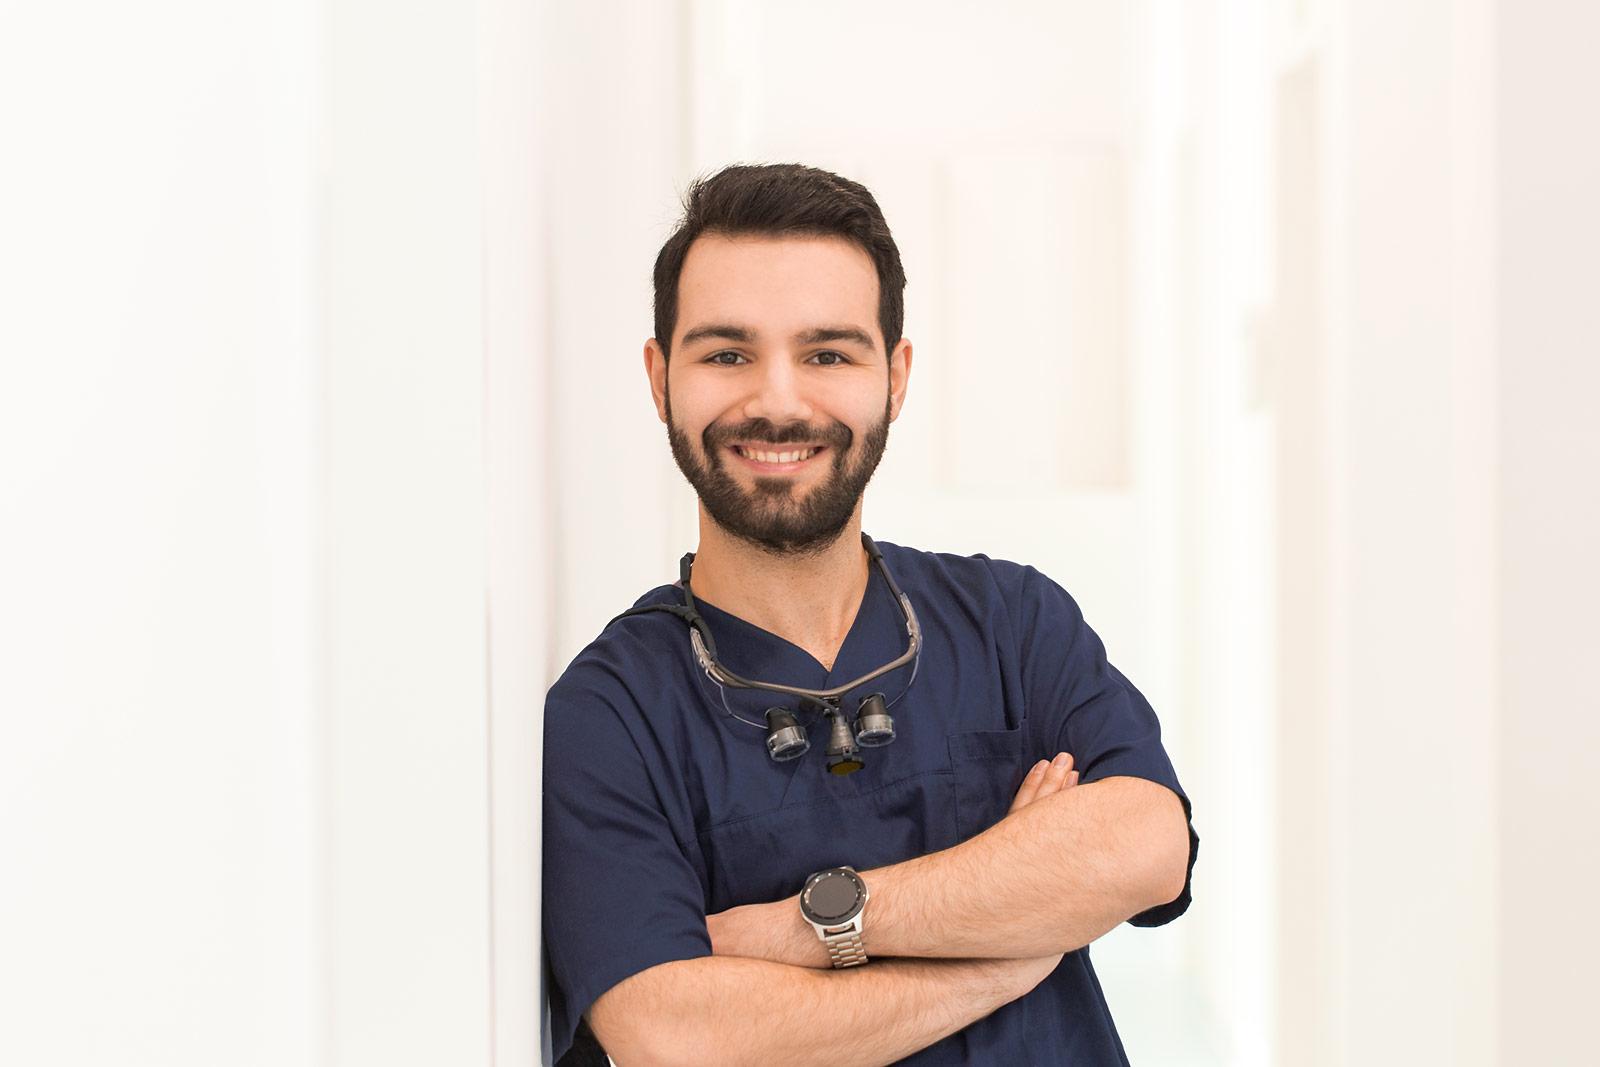 01 businessfotograf arztpraxis zahnarzt praxis welldent medical - Businessfotografie in der Zahnarztpraxis